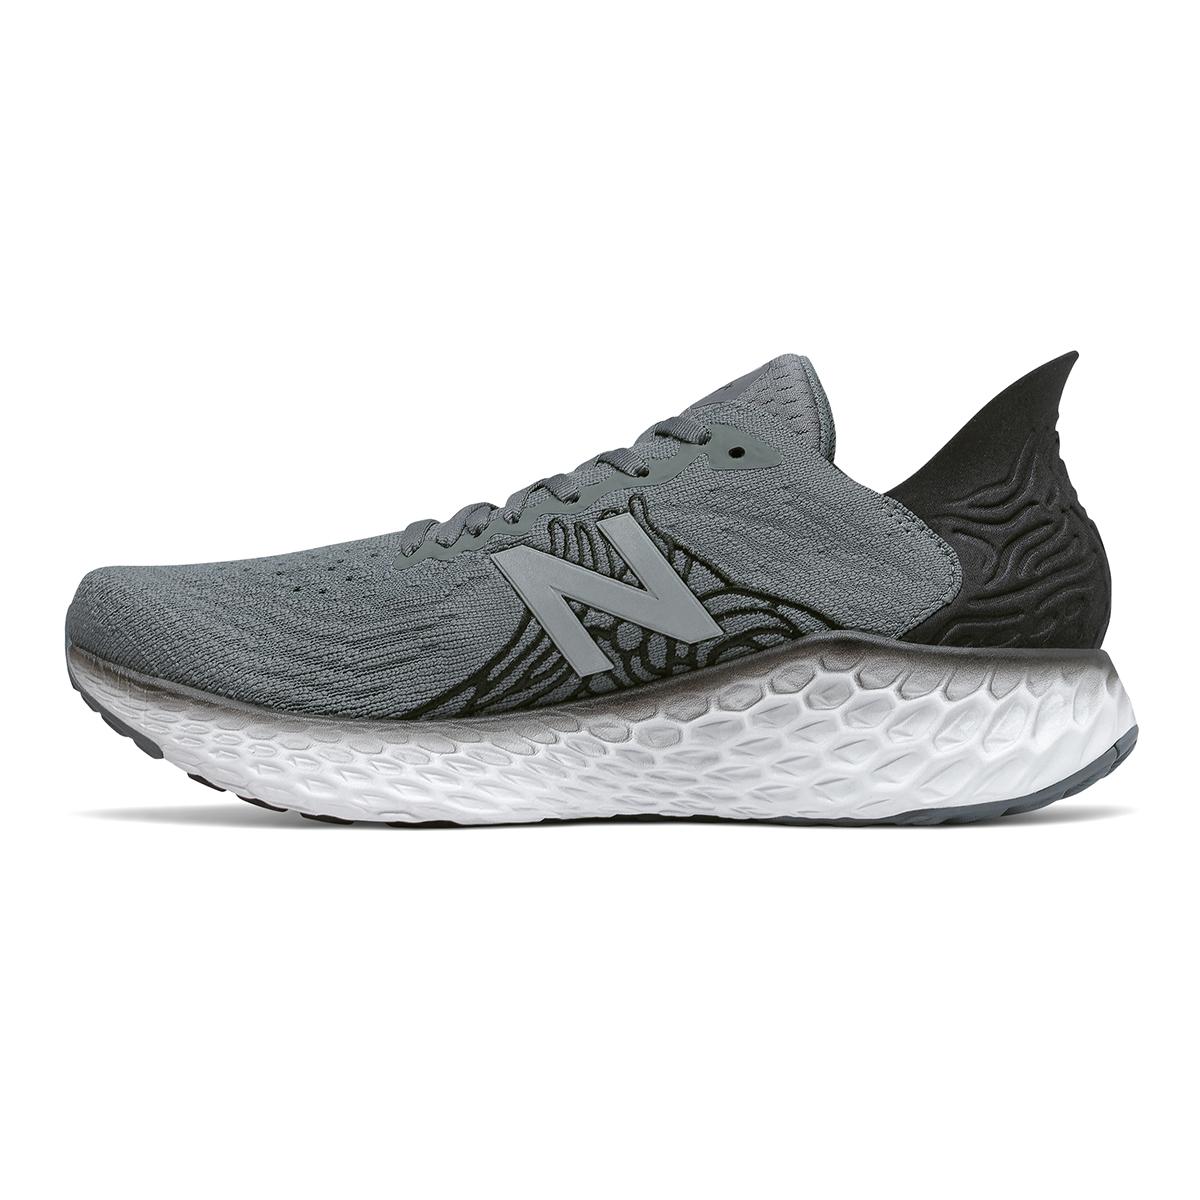 Men's New Balance Fresh Foam 1080v10 Running Shoe - Color: Lead - Size: 7 - Width: Wide, Lead, large, image 2